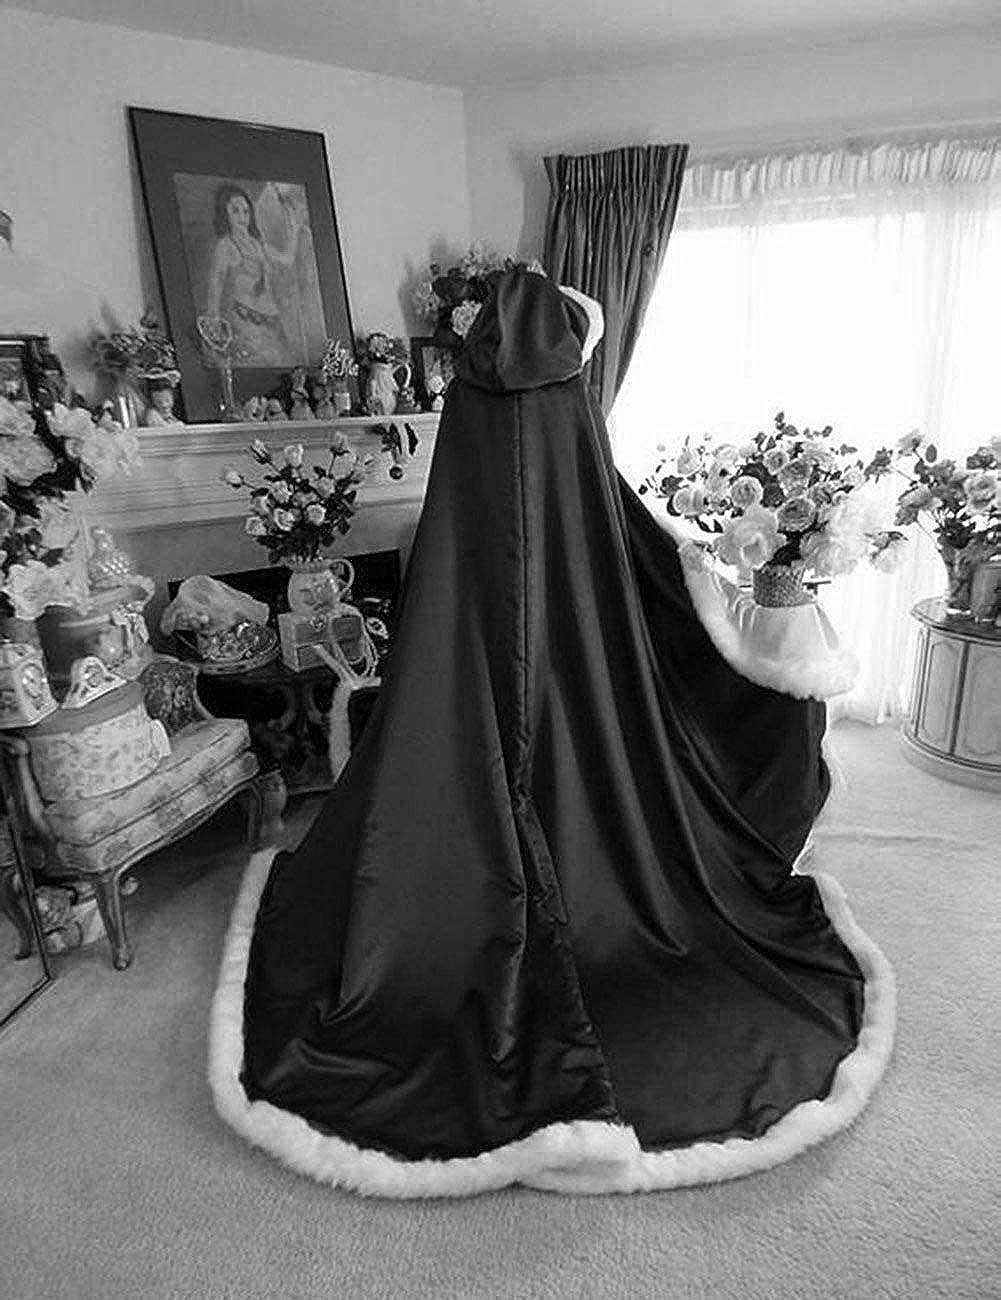 Lemai Warm Long Wedding Cloak Hooded Cape Winter Fur Trim and Hand Muff 71 IN